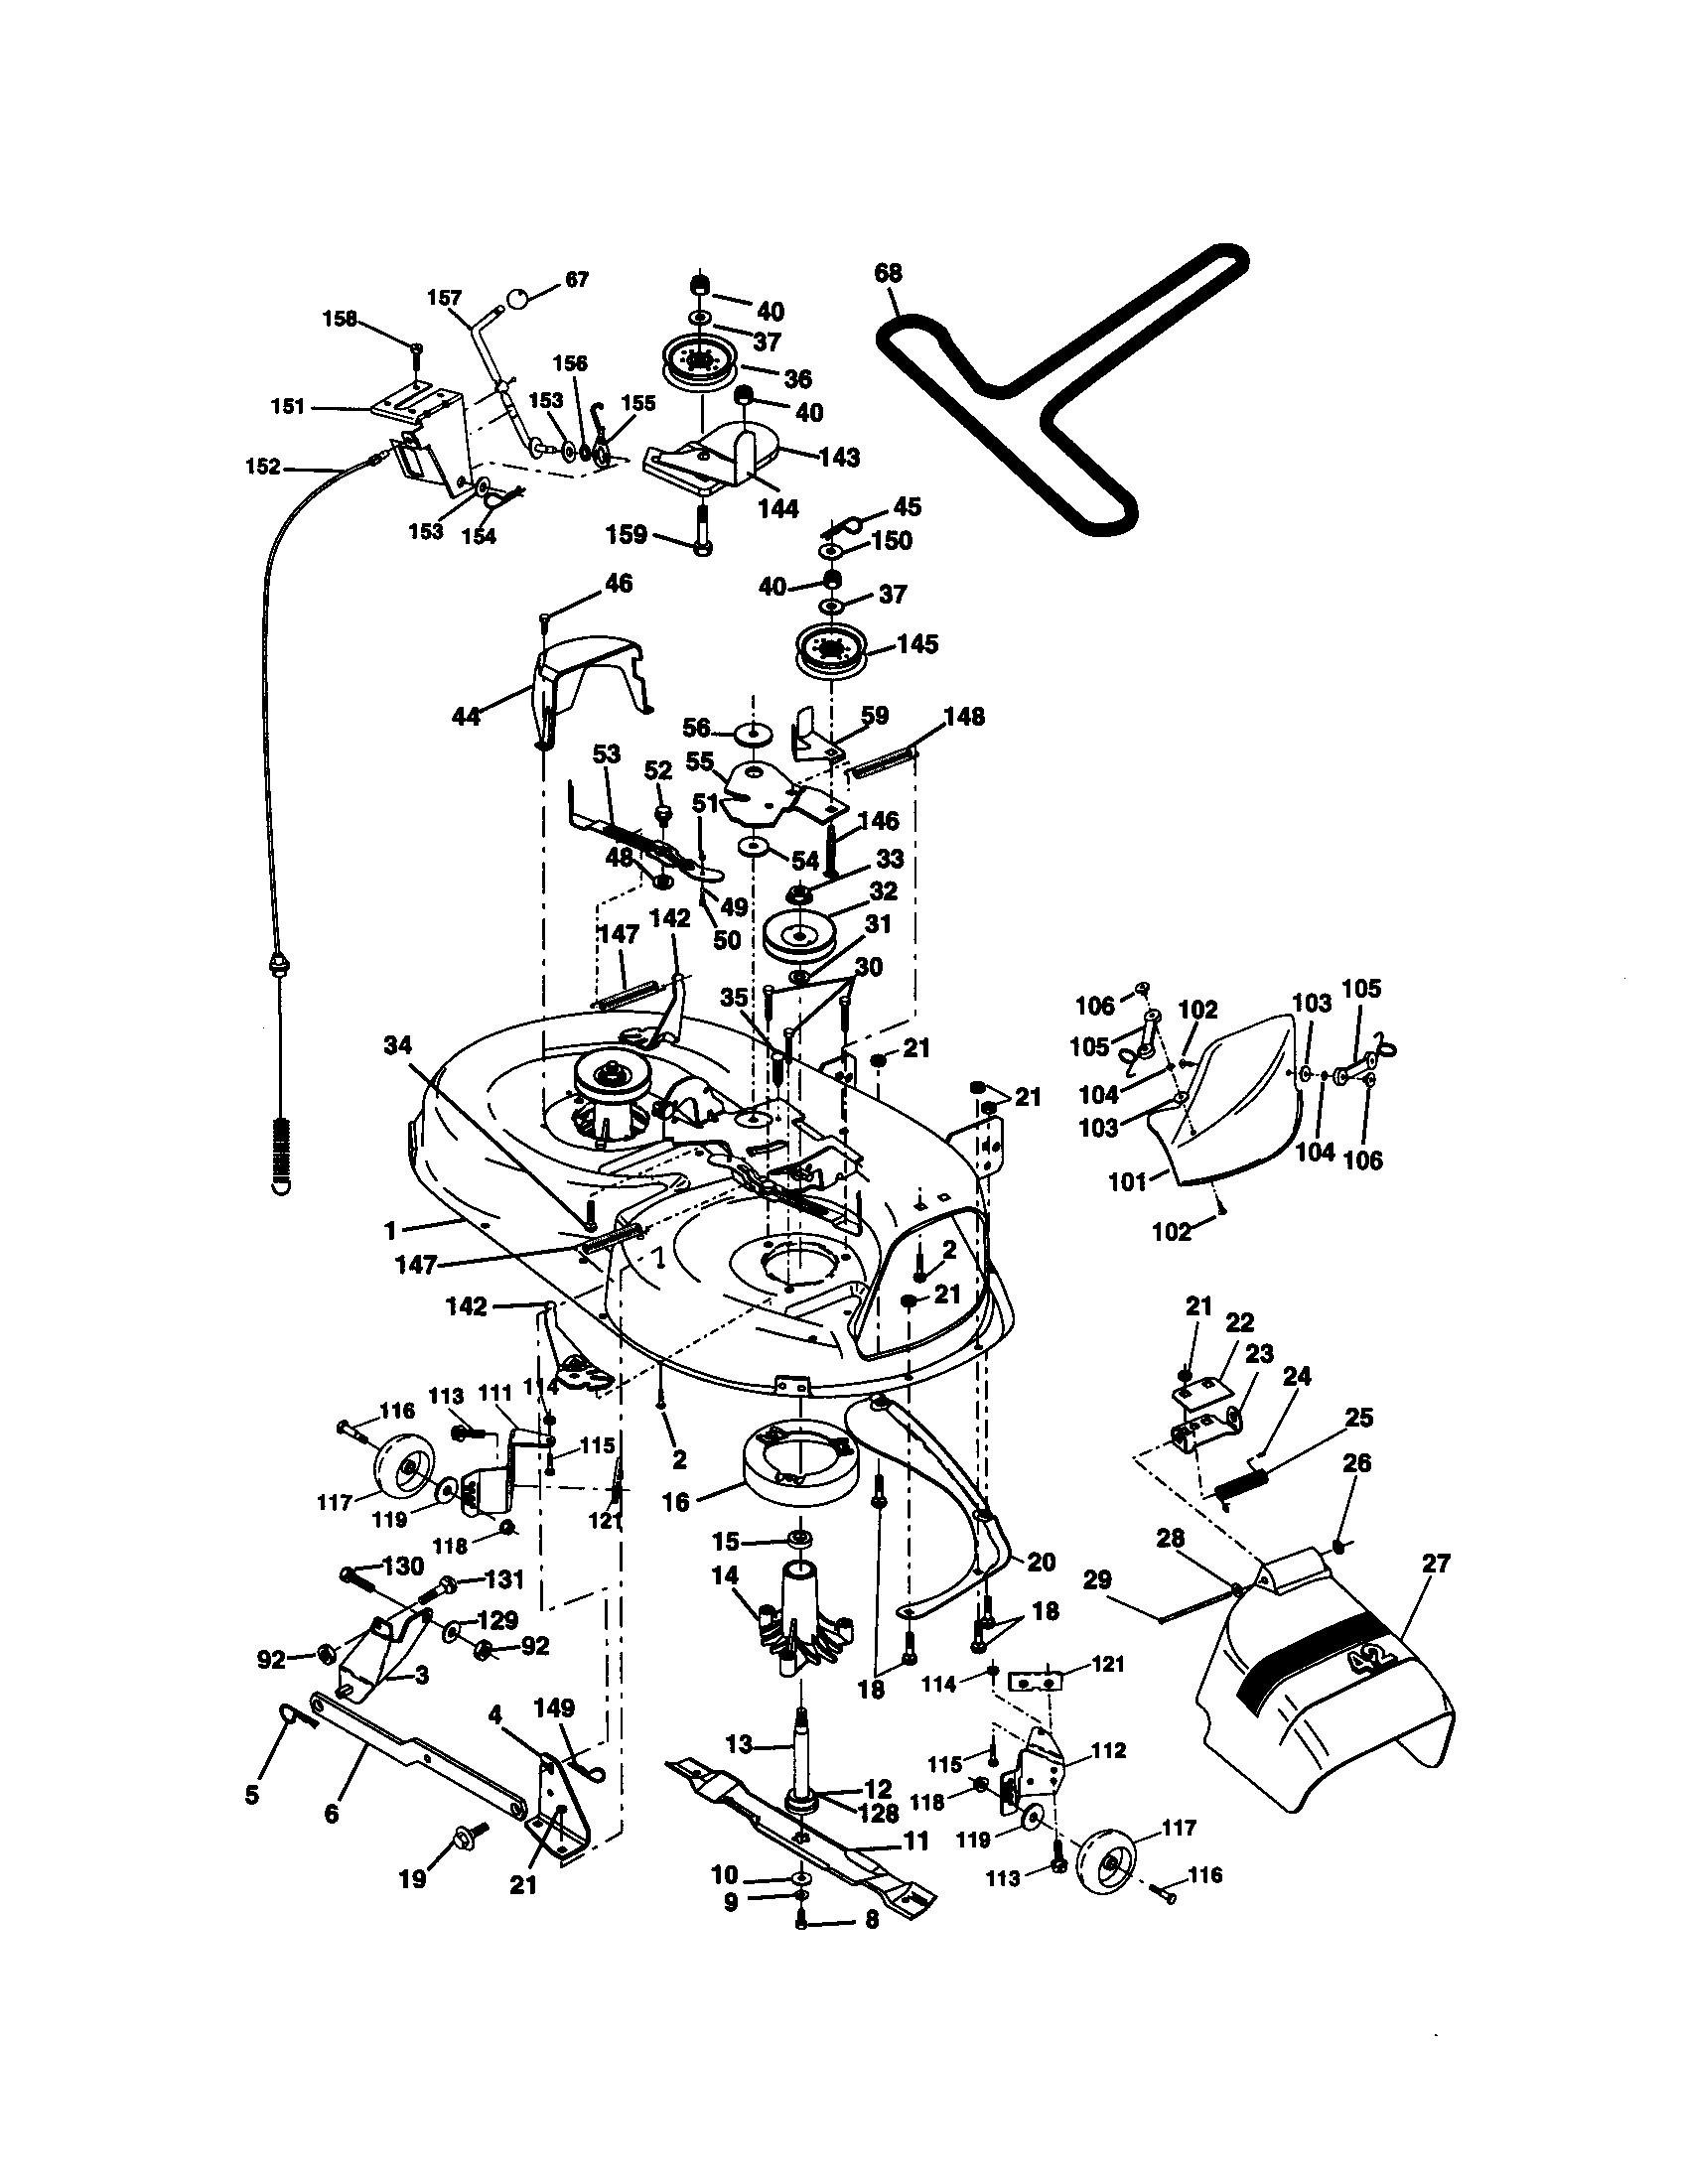 17.5 Hp Craftsman Wiring Diagram Briggs and Stratton 17 5 Hp Engine Parts Diagram Of 17.5 Hp Craftsman Wiring Diagram